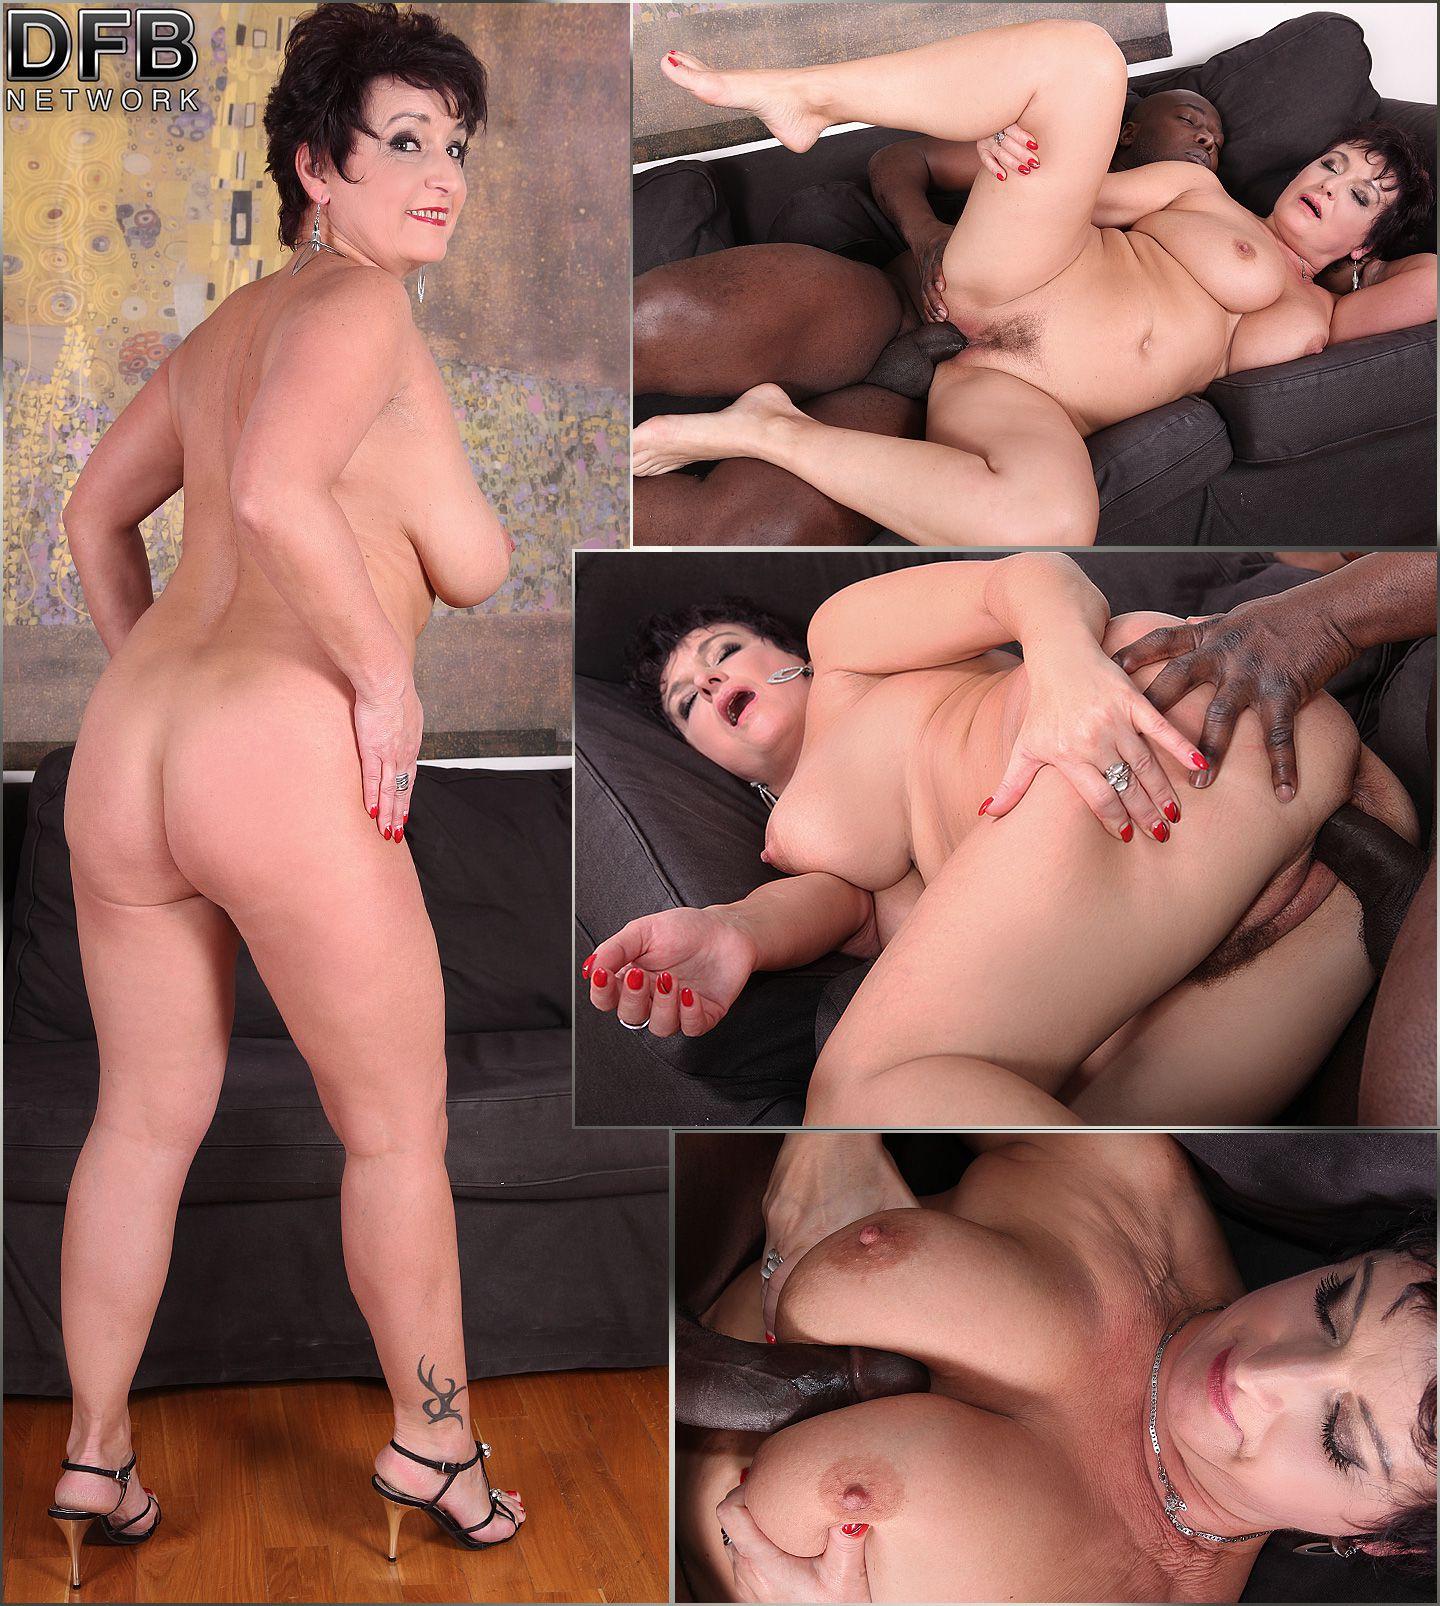 Midget with big tits